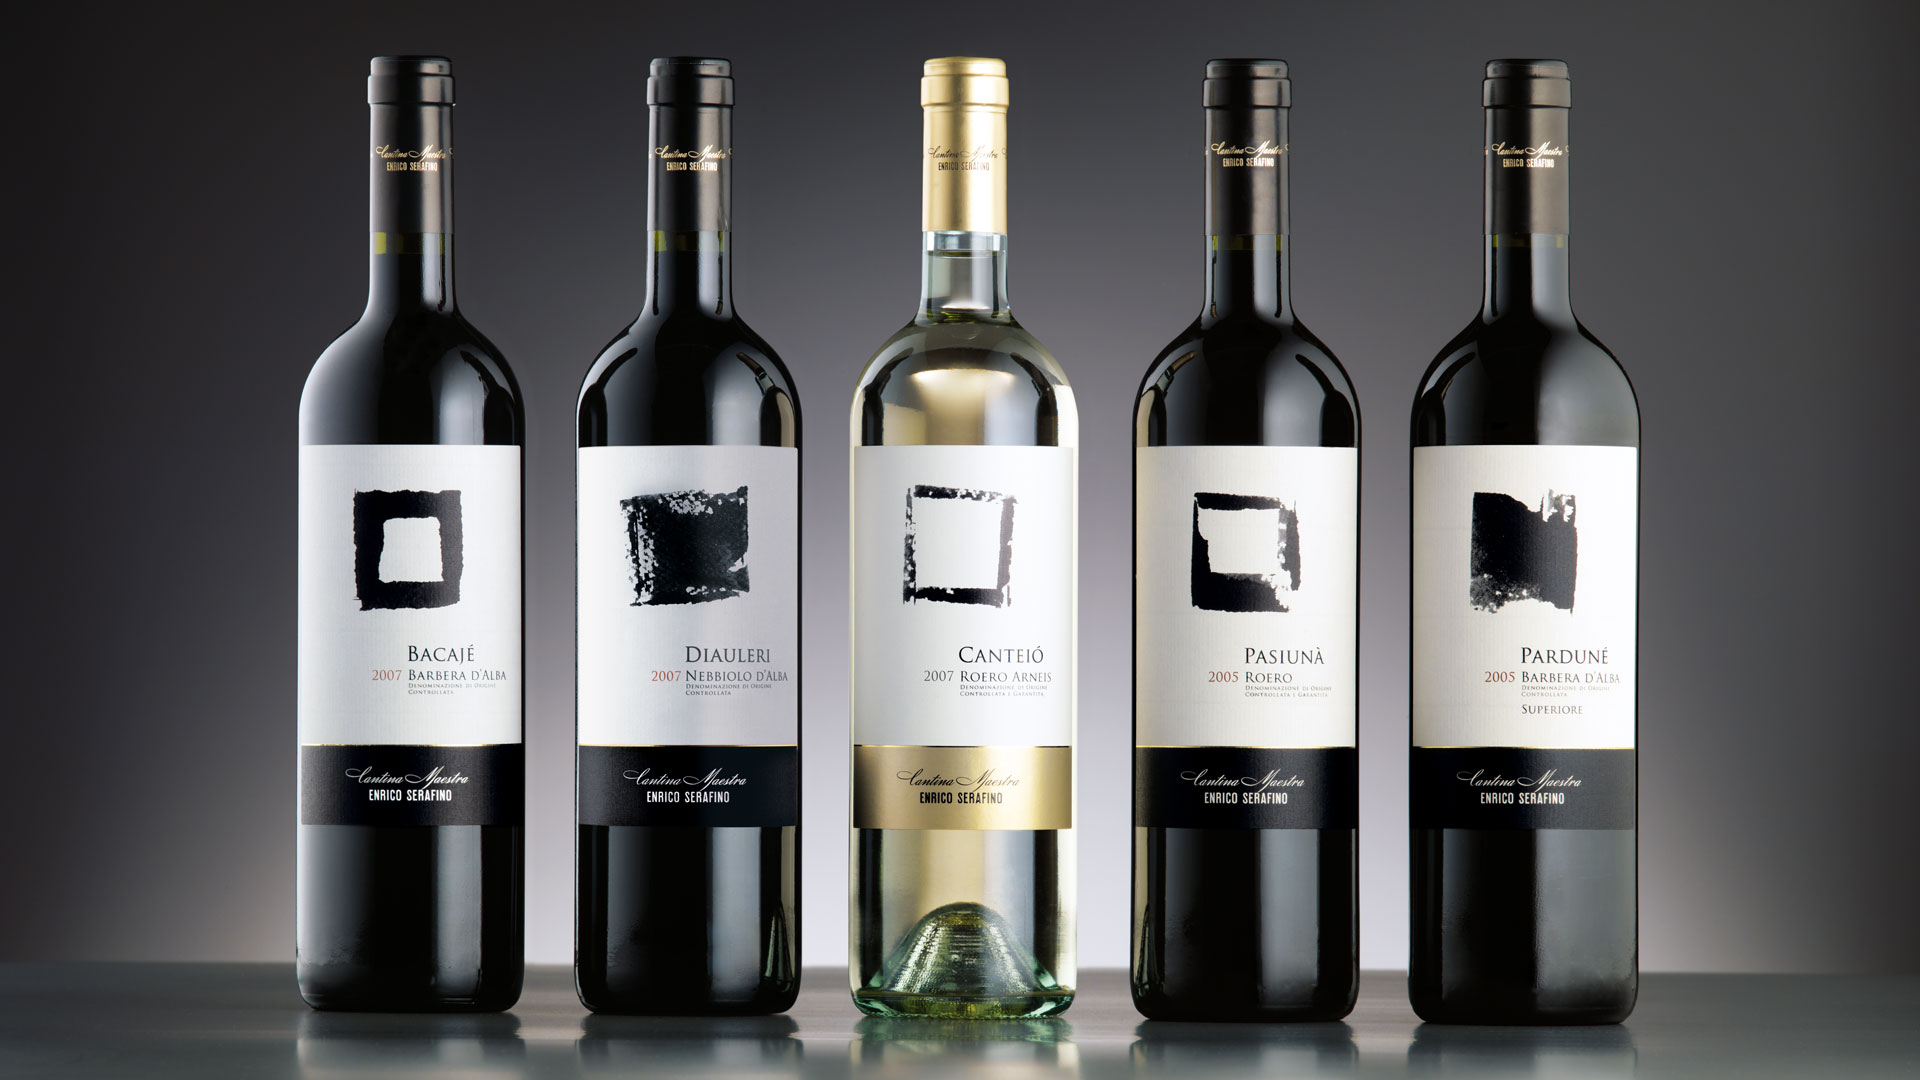 Campari Wines Enrico Serafino packaging Linea Top